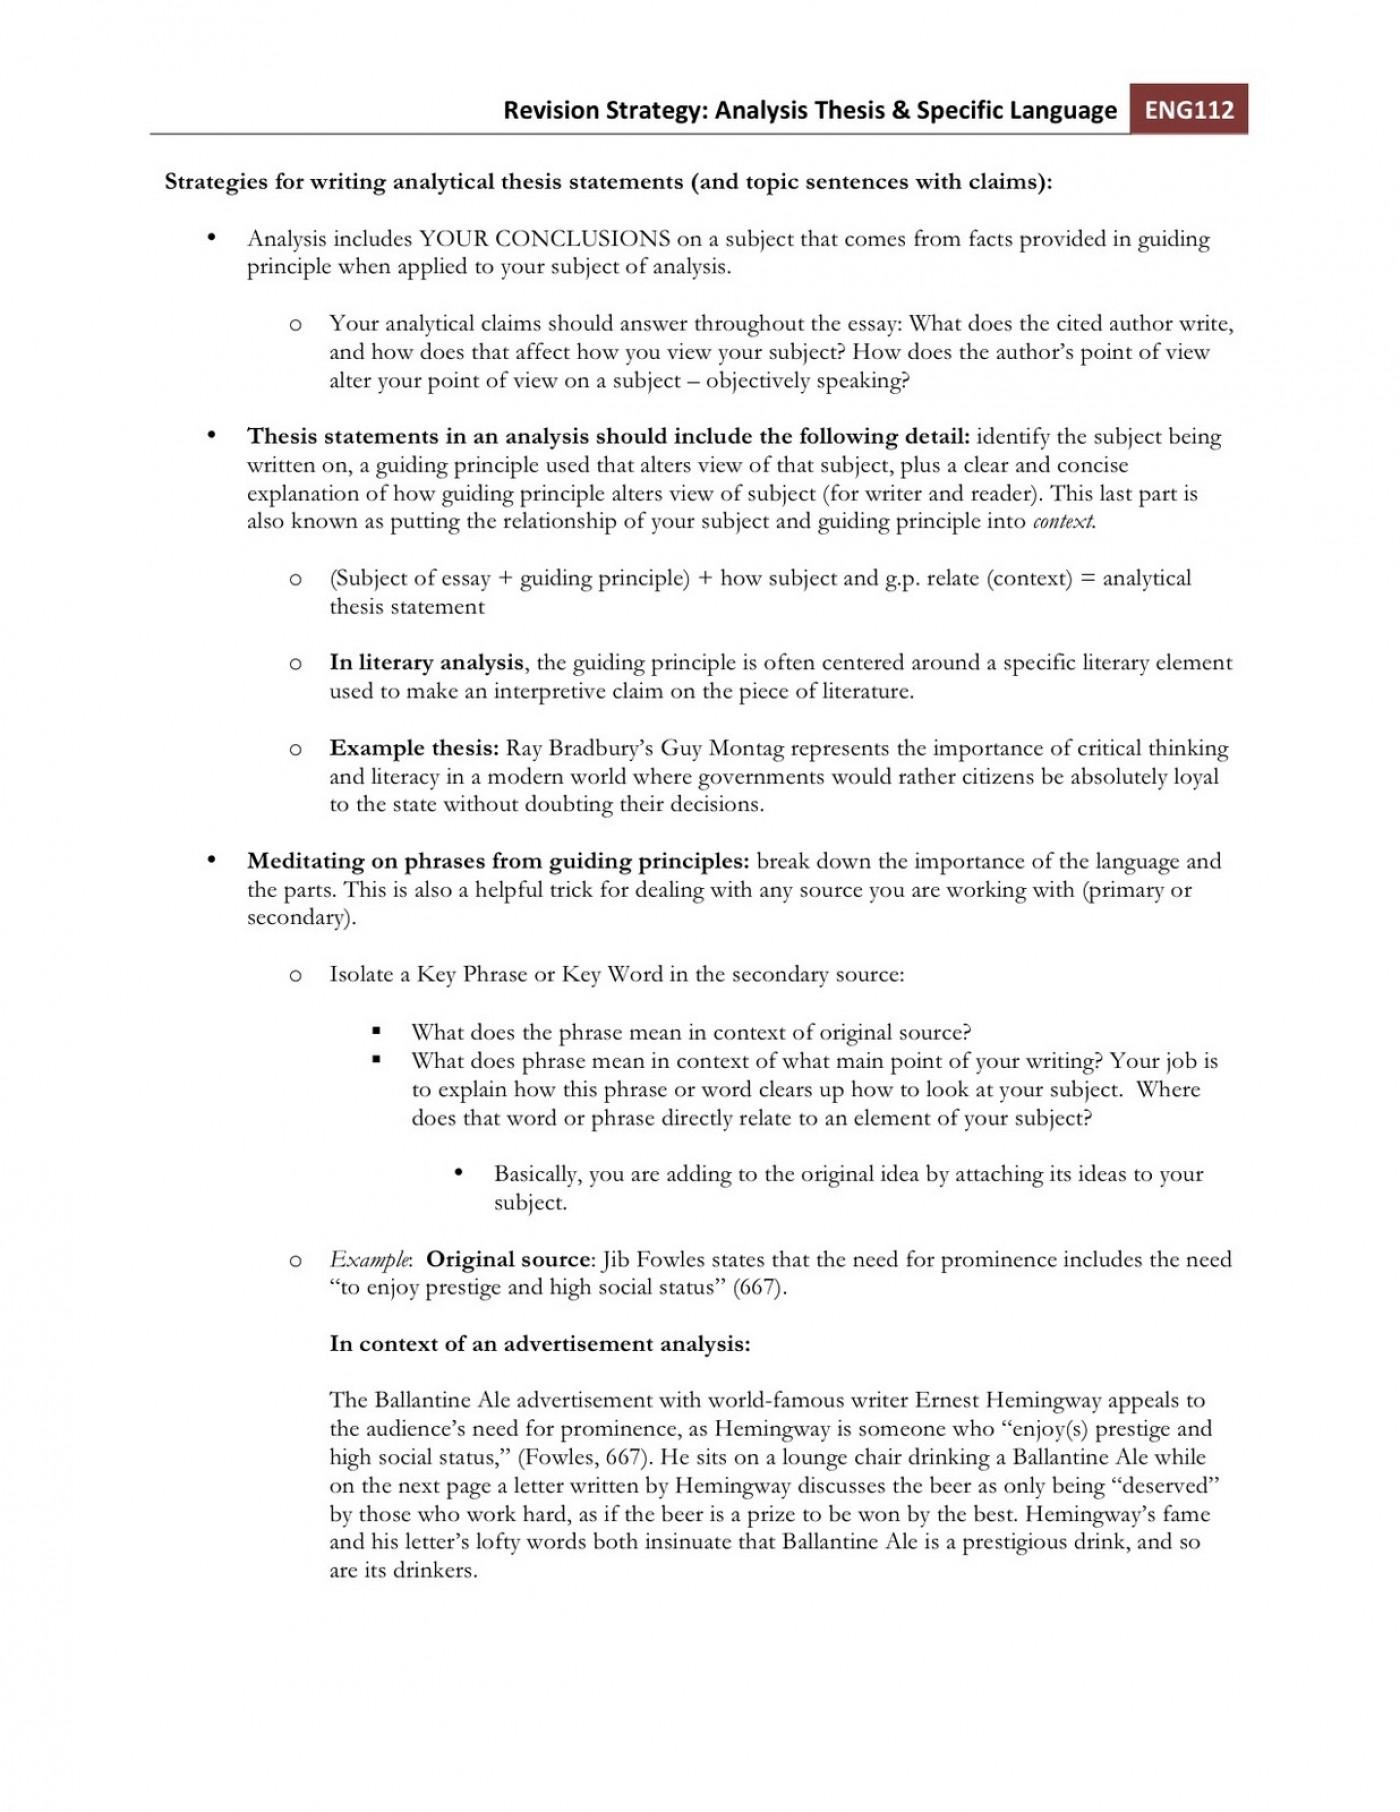 006 Strategiesforwritinganalyticalthesisstatements Essay Example Phenomenal Eslrs 1400